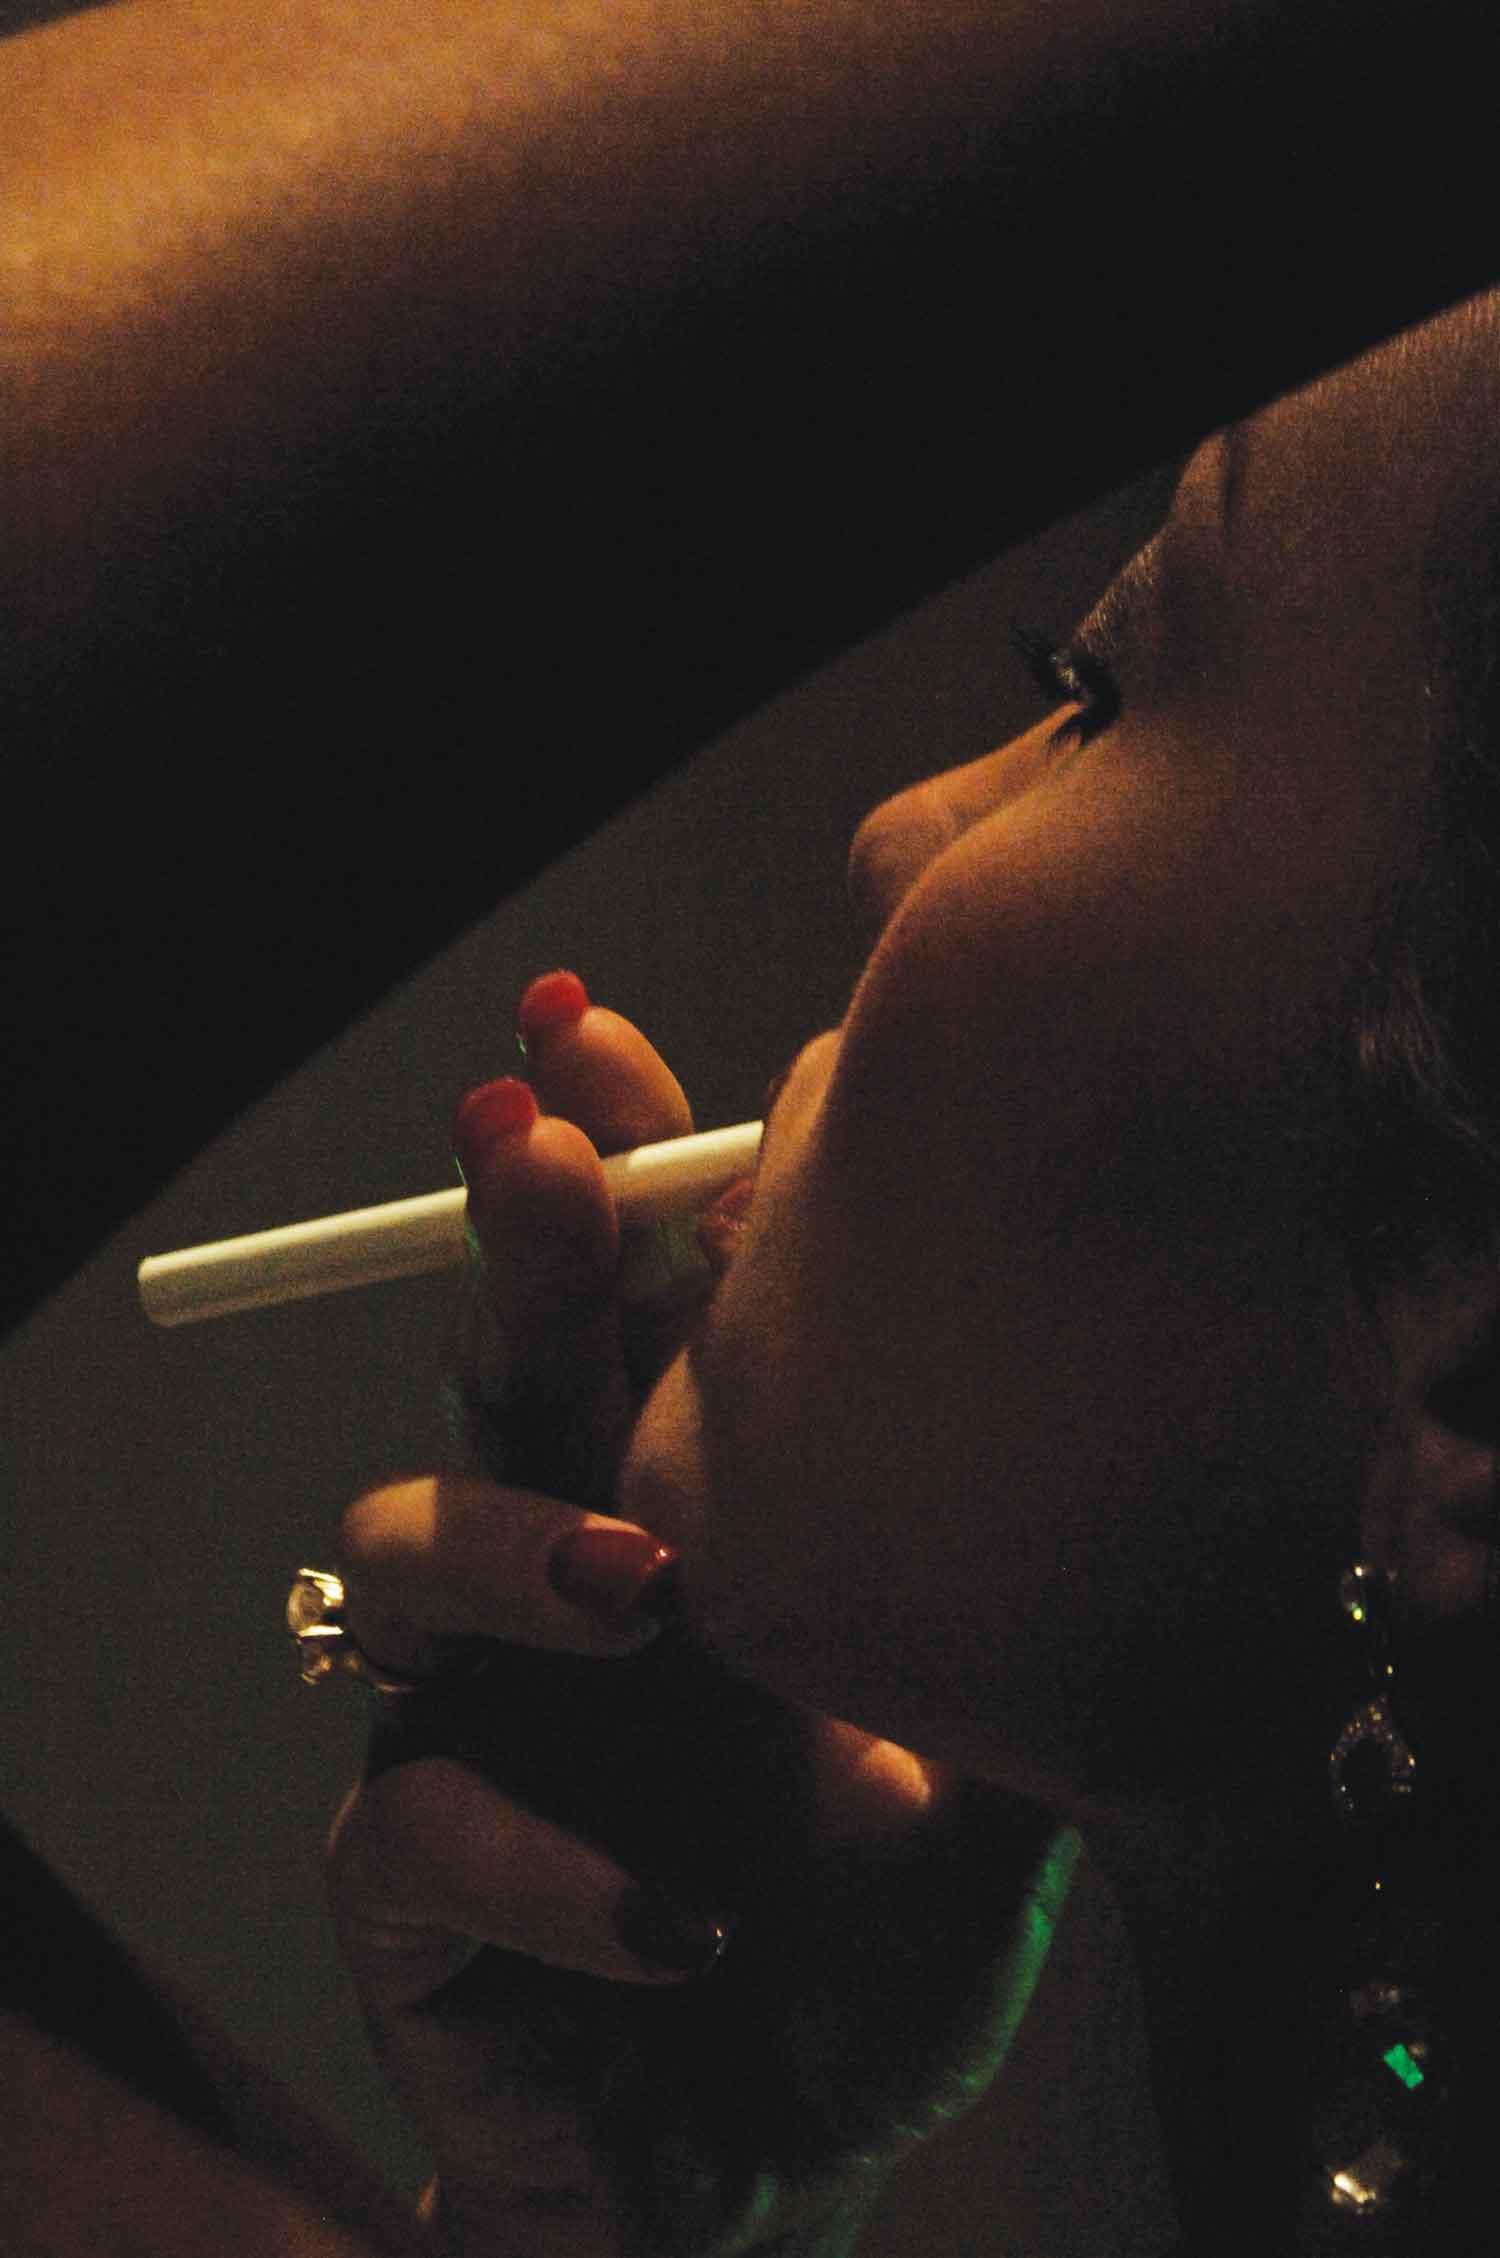 Aryan Kaganof, SMS Sugar Man, 2005-2006, cellphone-made film, 81 min. Courtesy of the artist.